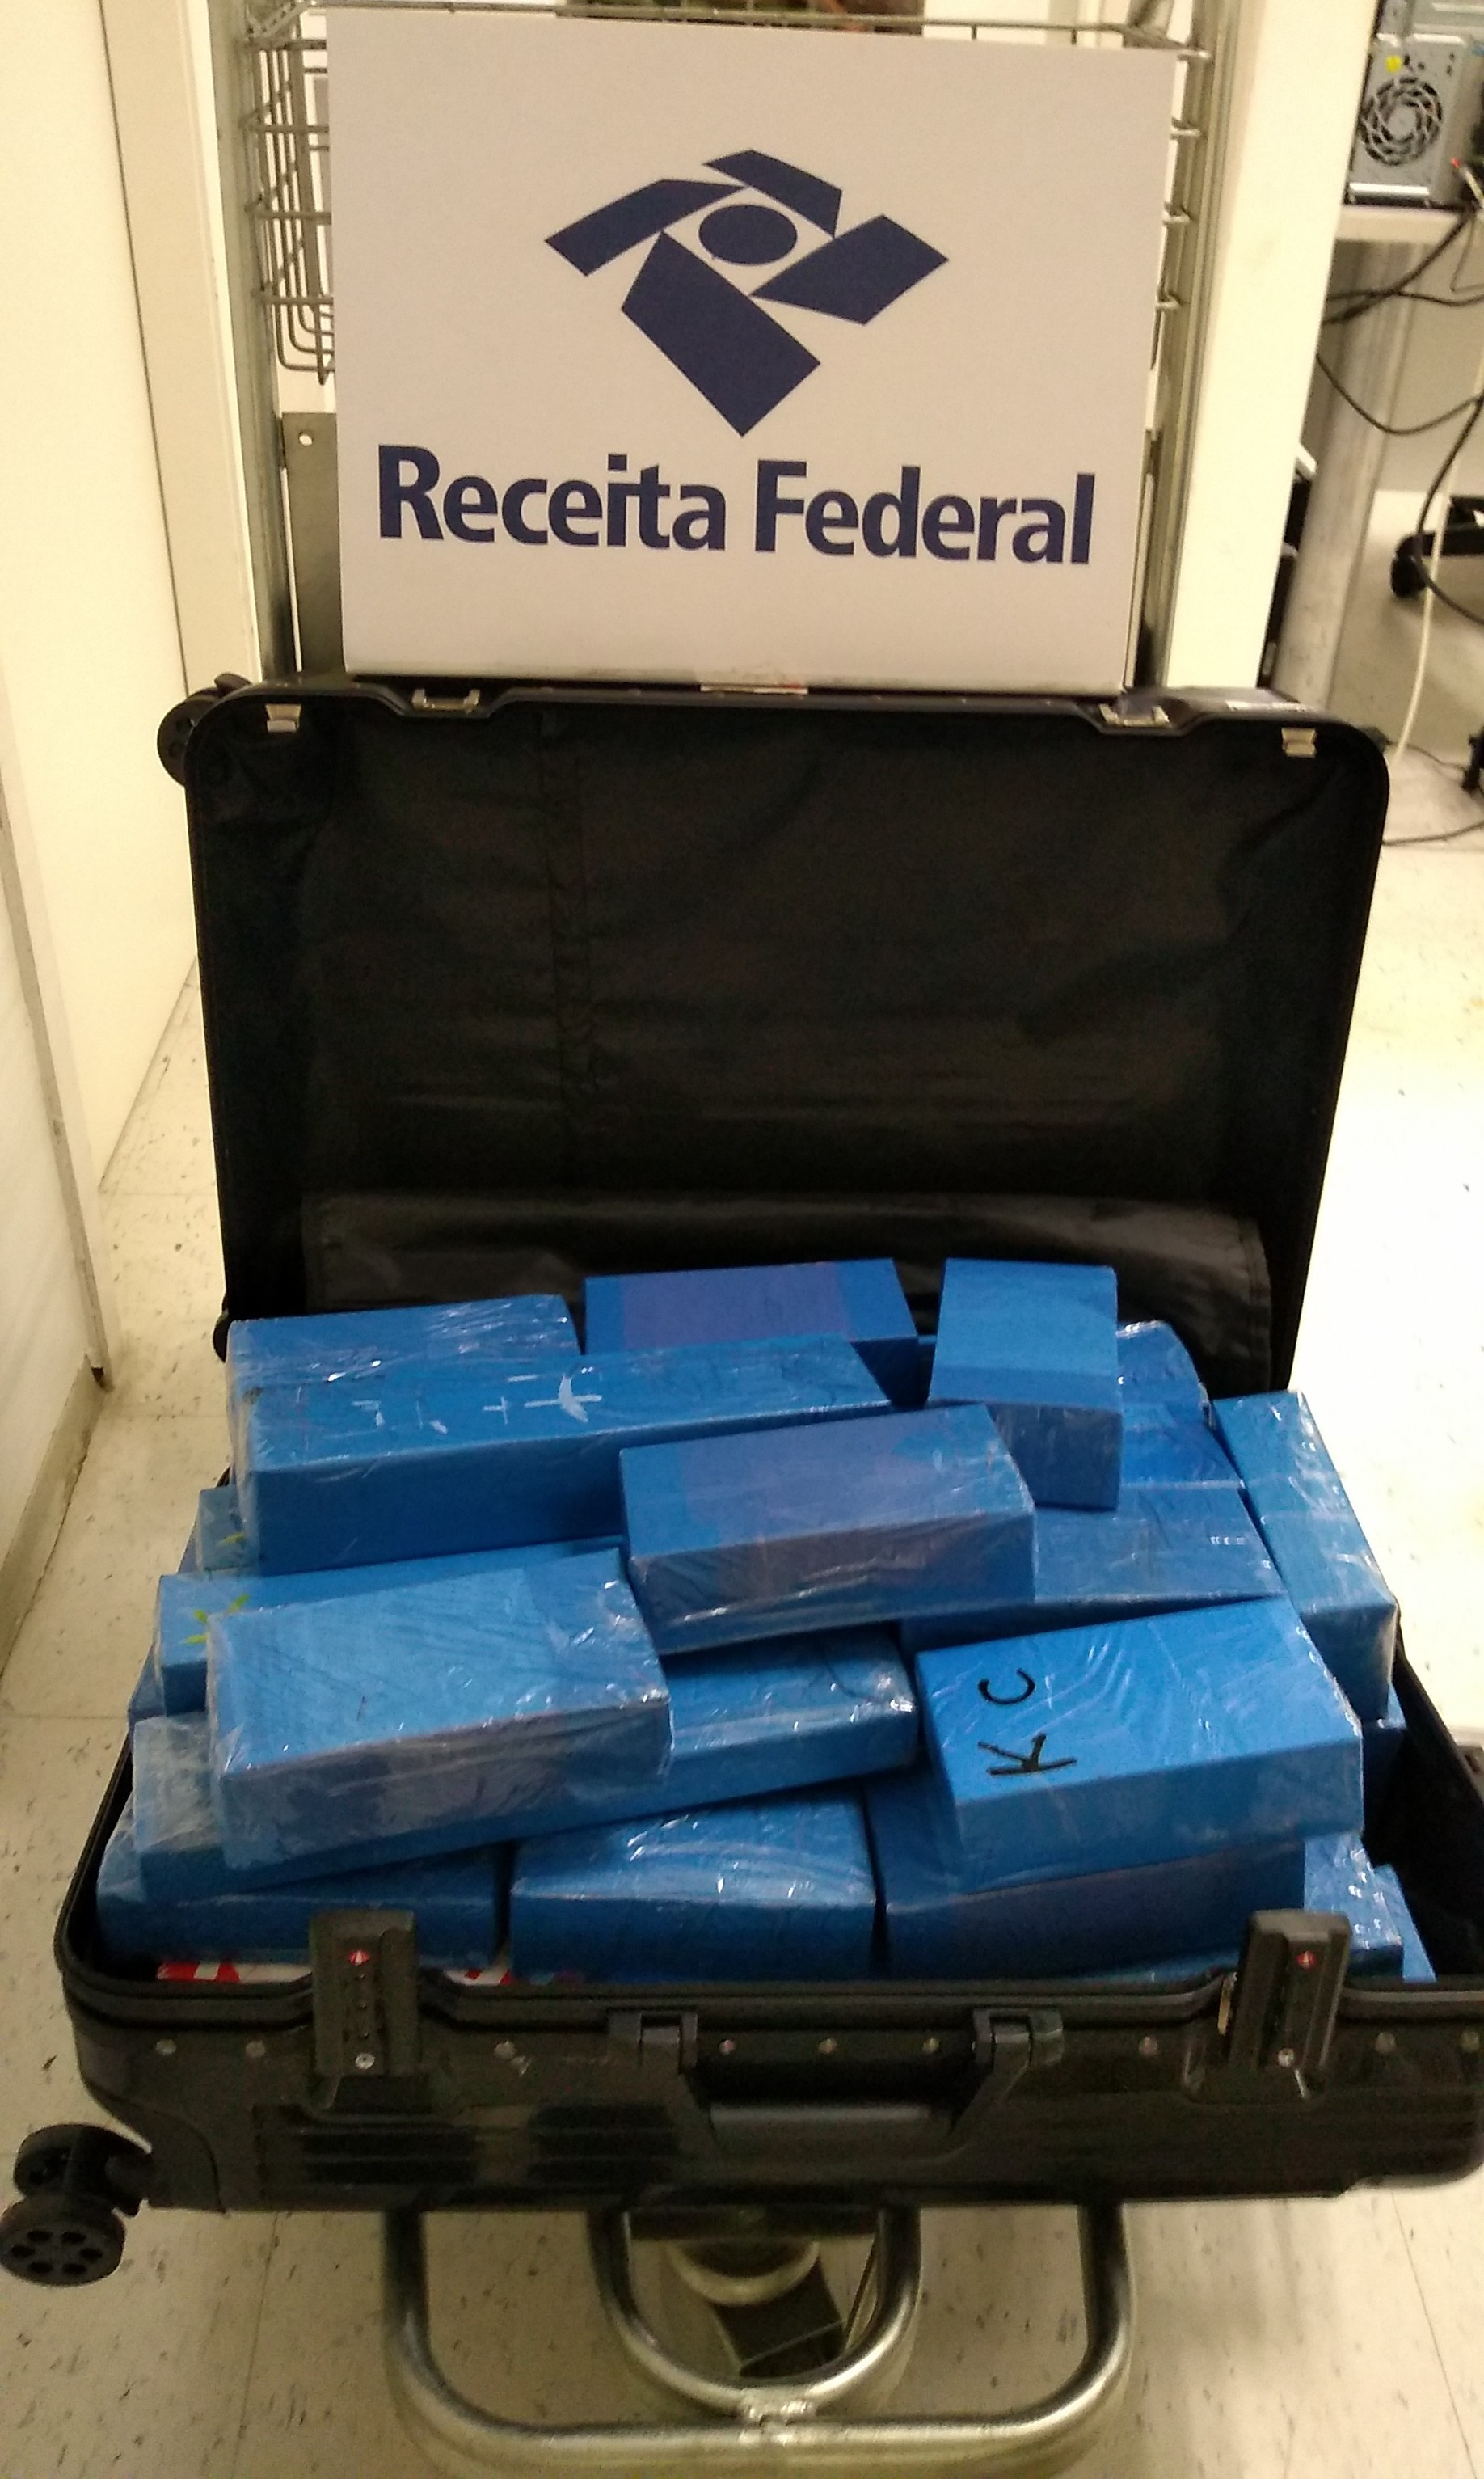 Receita Federal apreende mais de 60 iPhones importados de forma irregular no aeroporto de Natal